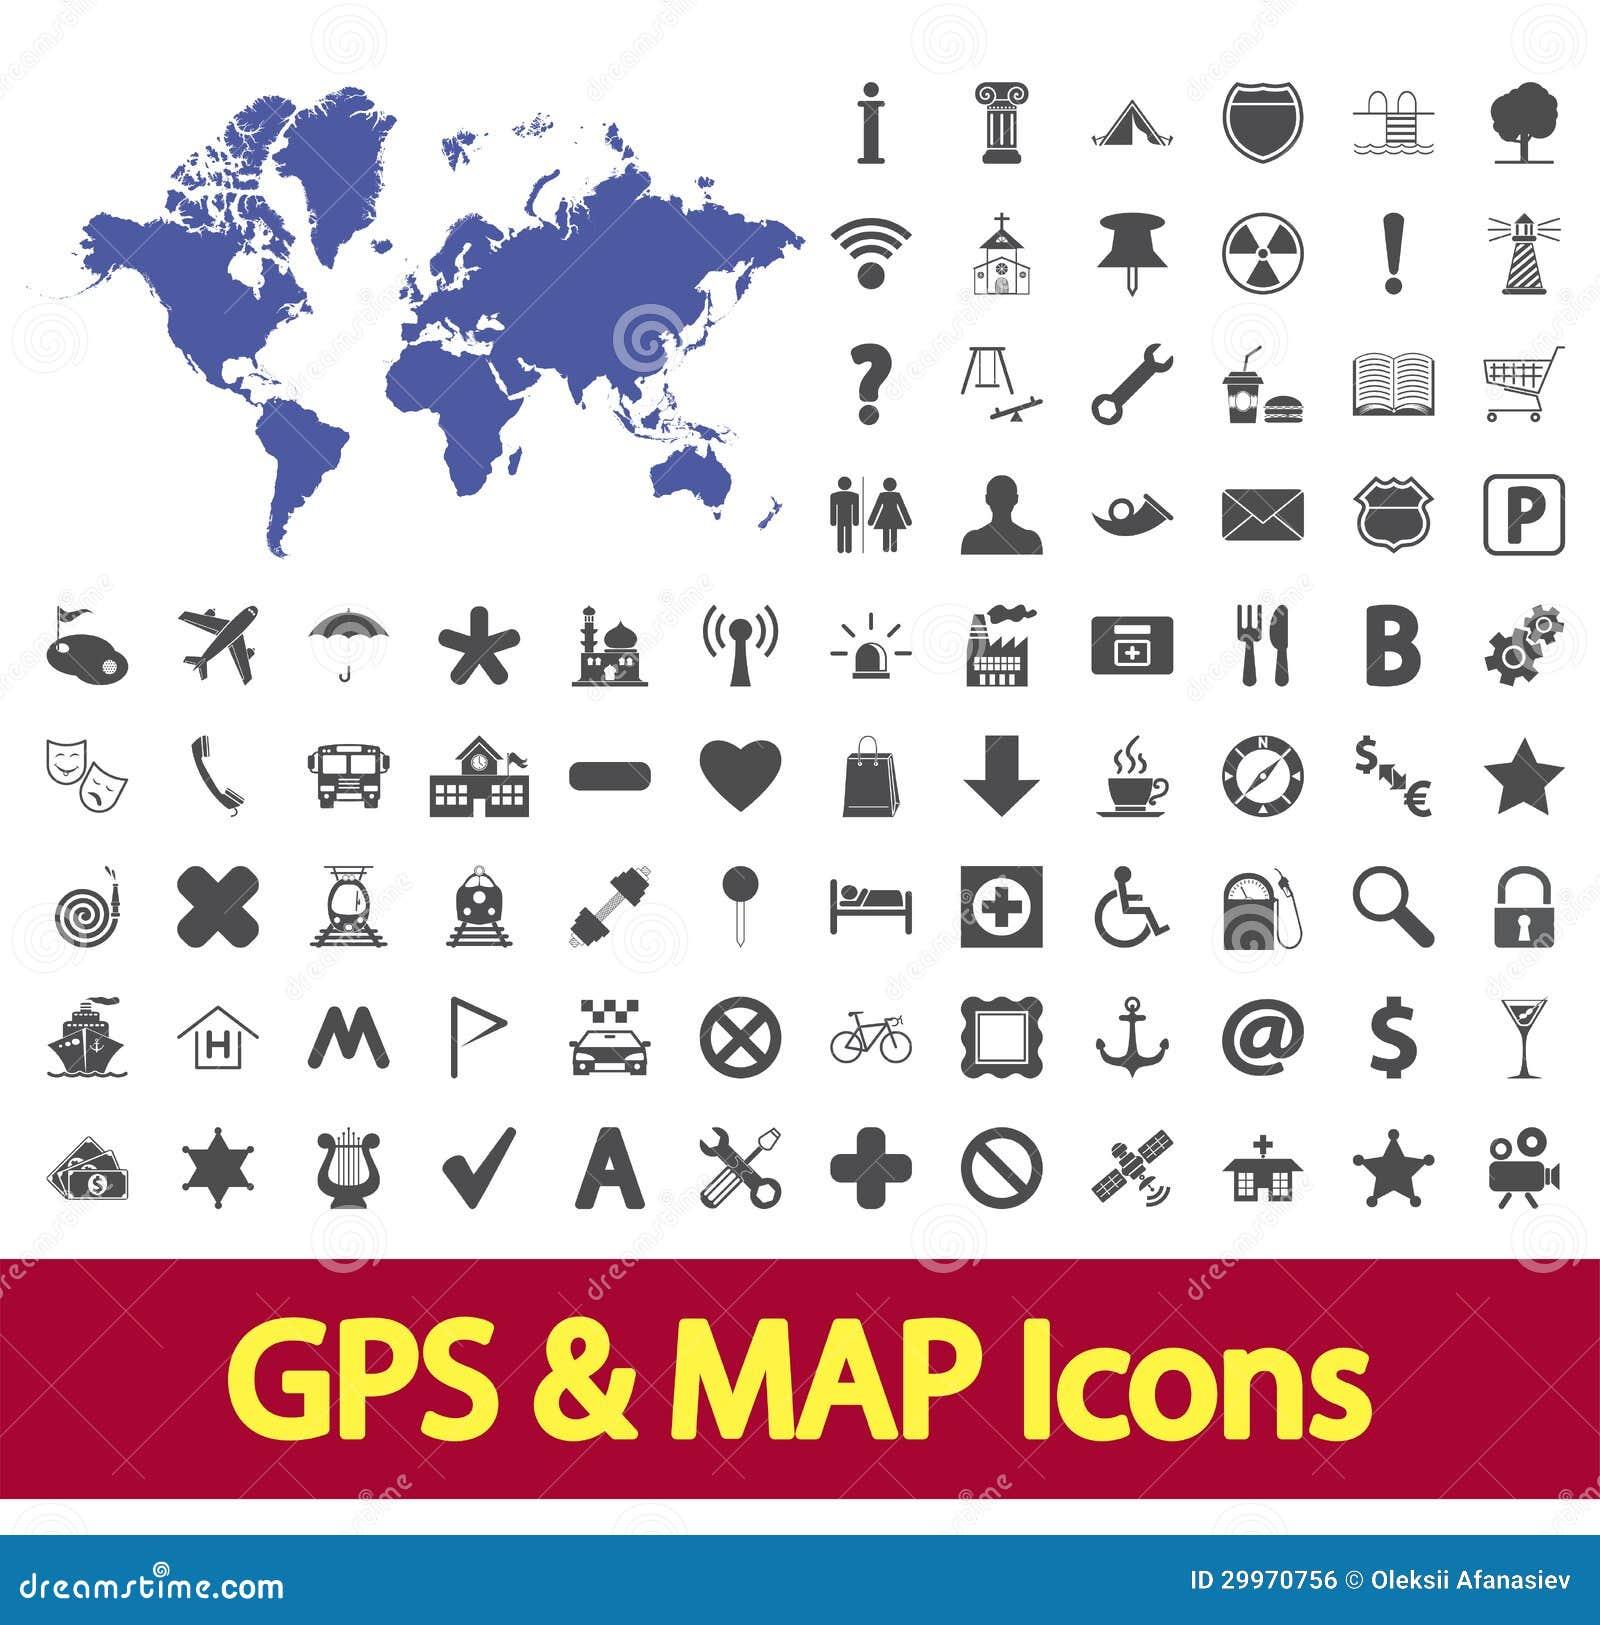 Navigation Map Icons. Royalty Free Stock Image - Image: 29970756